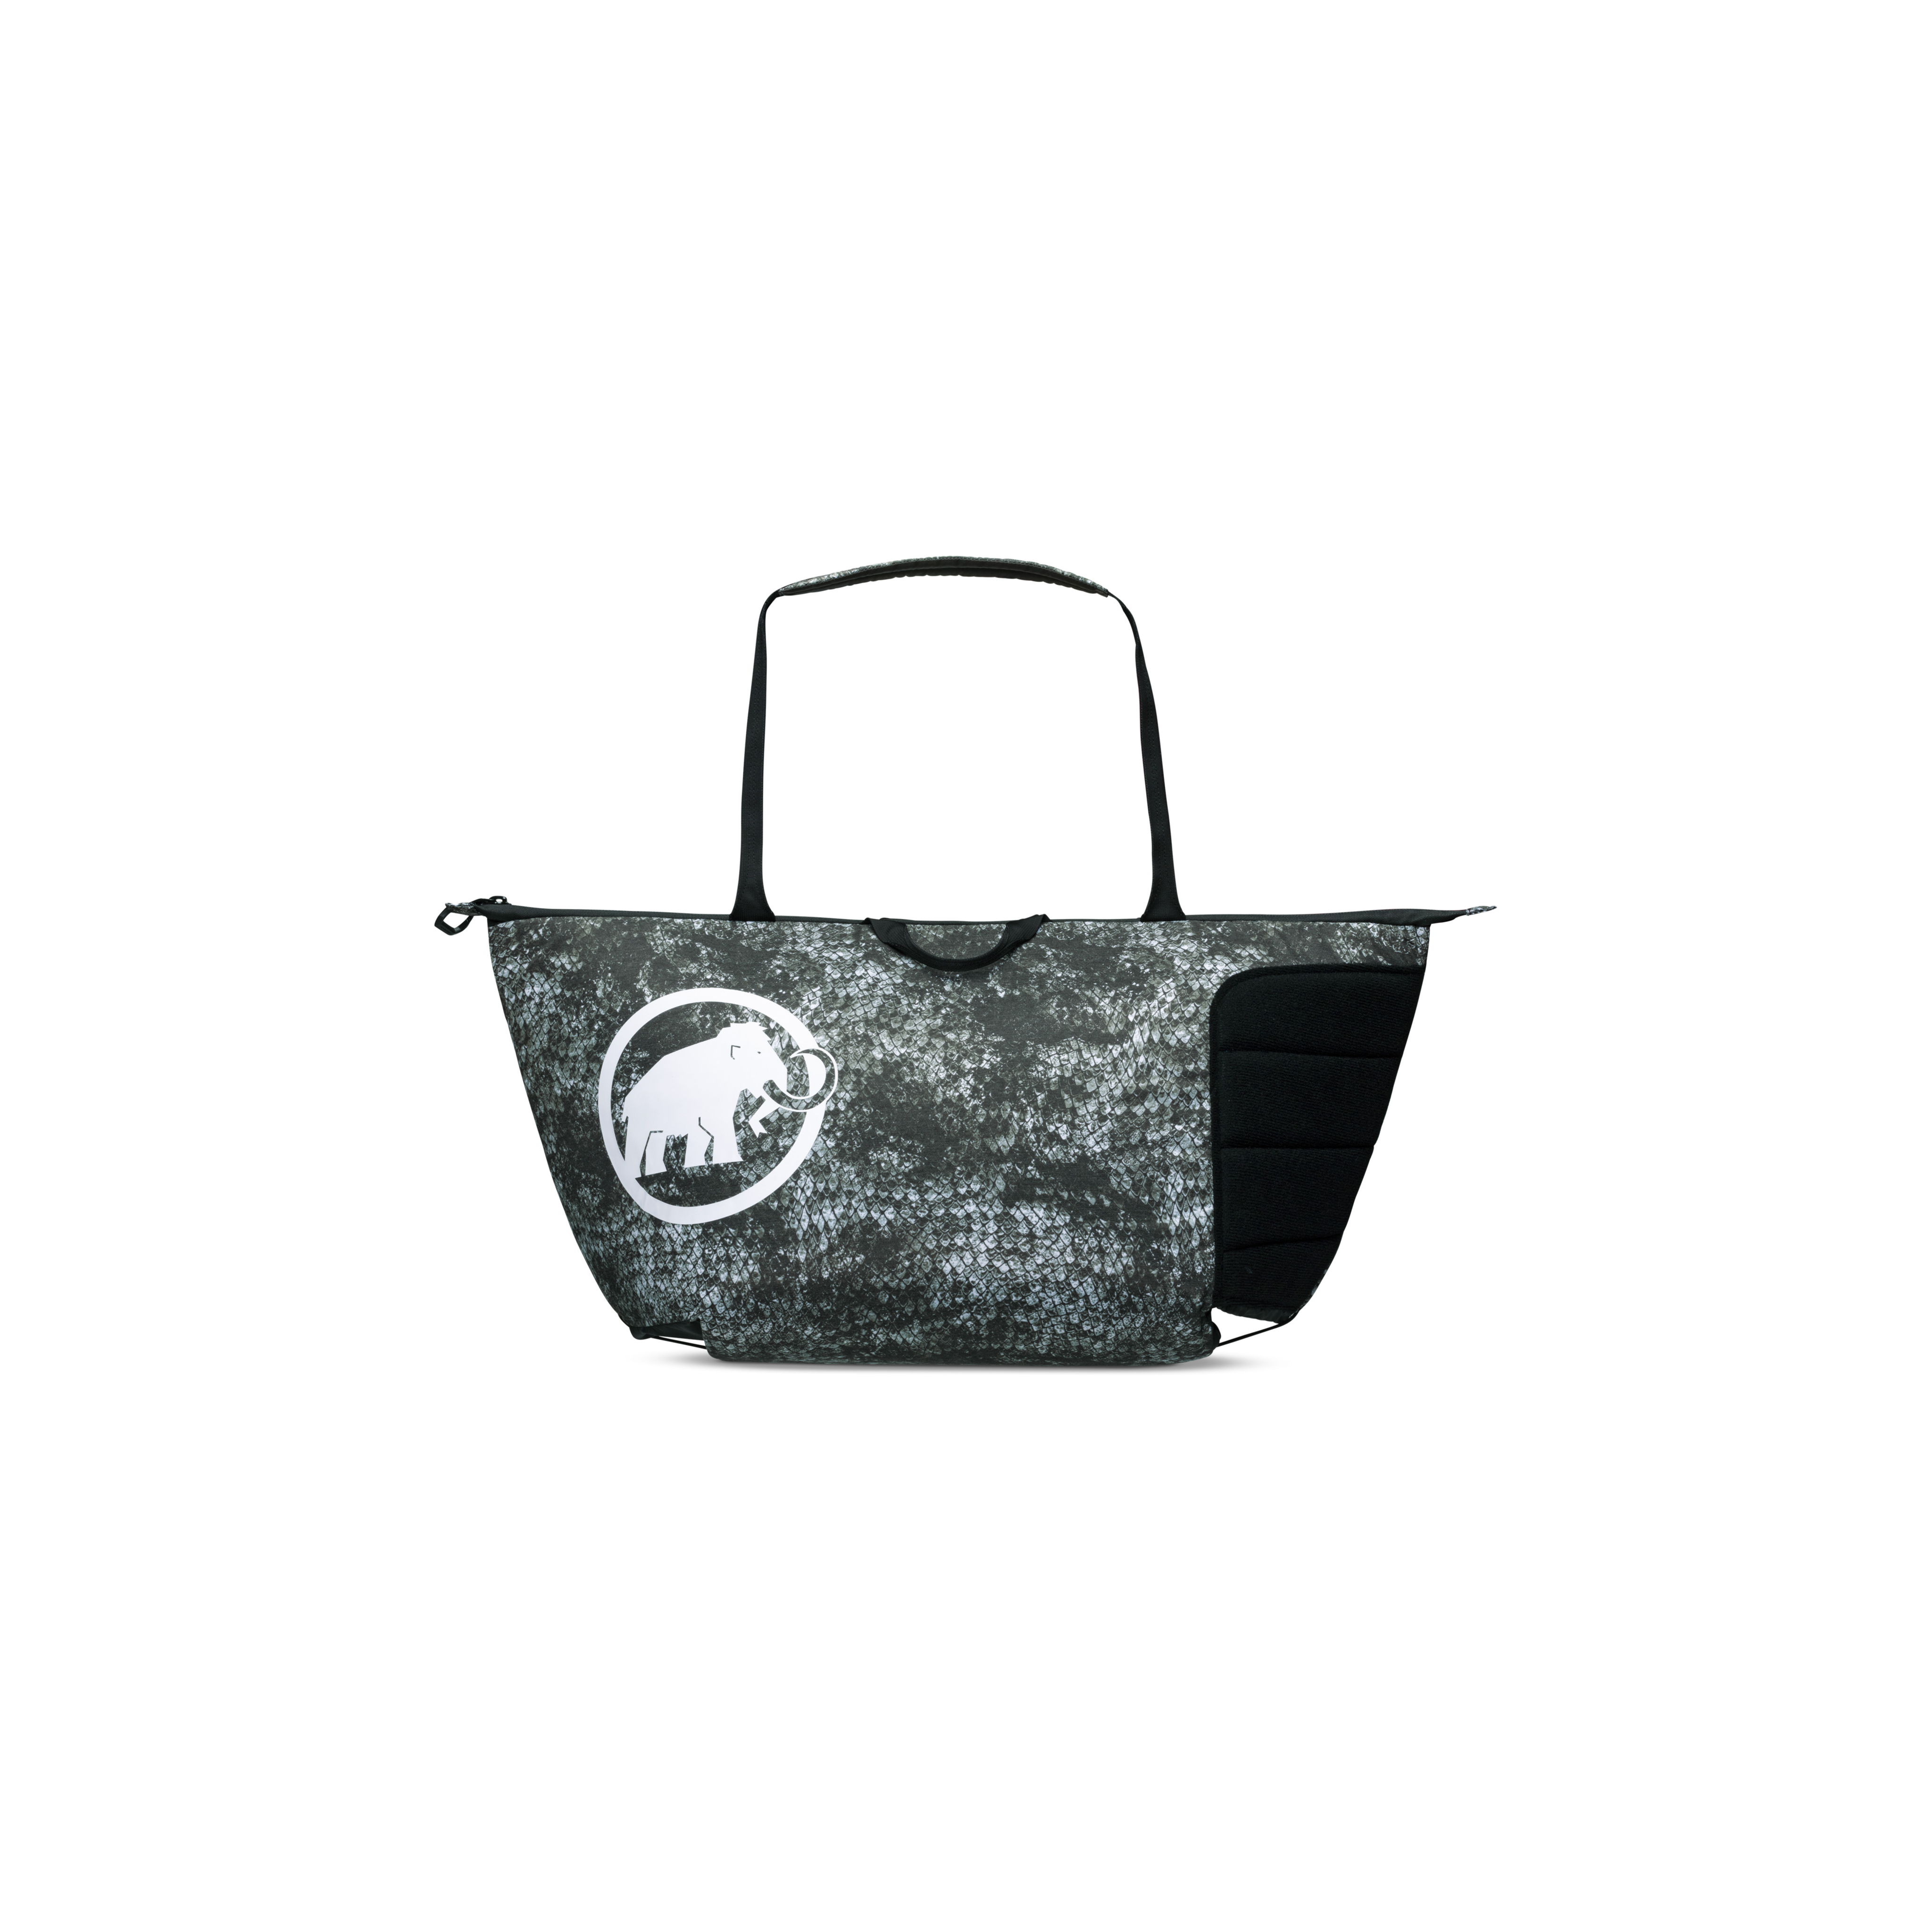 Magic Rope Bag X - asp, one size product image